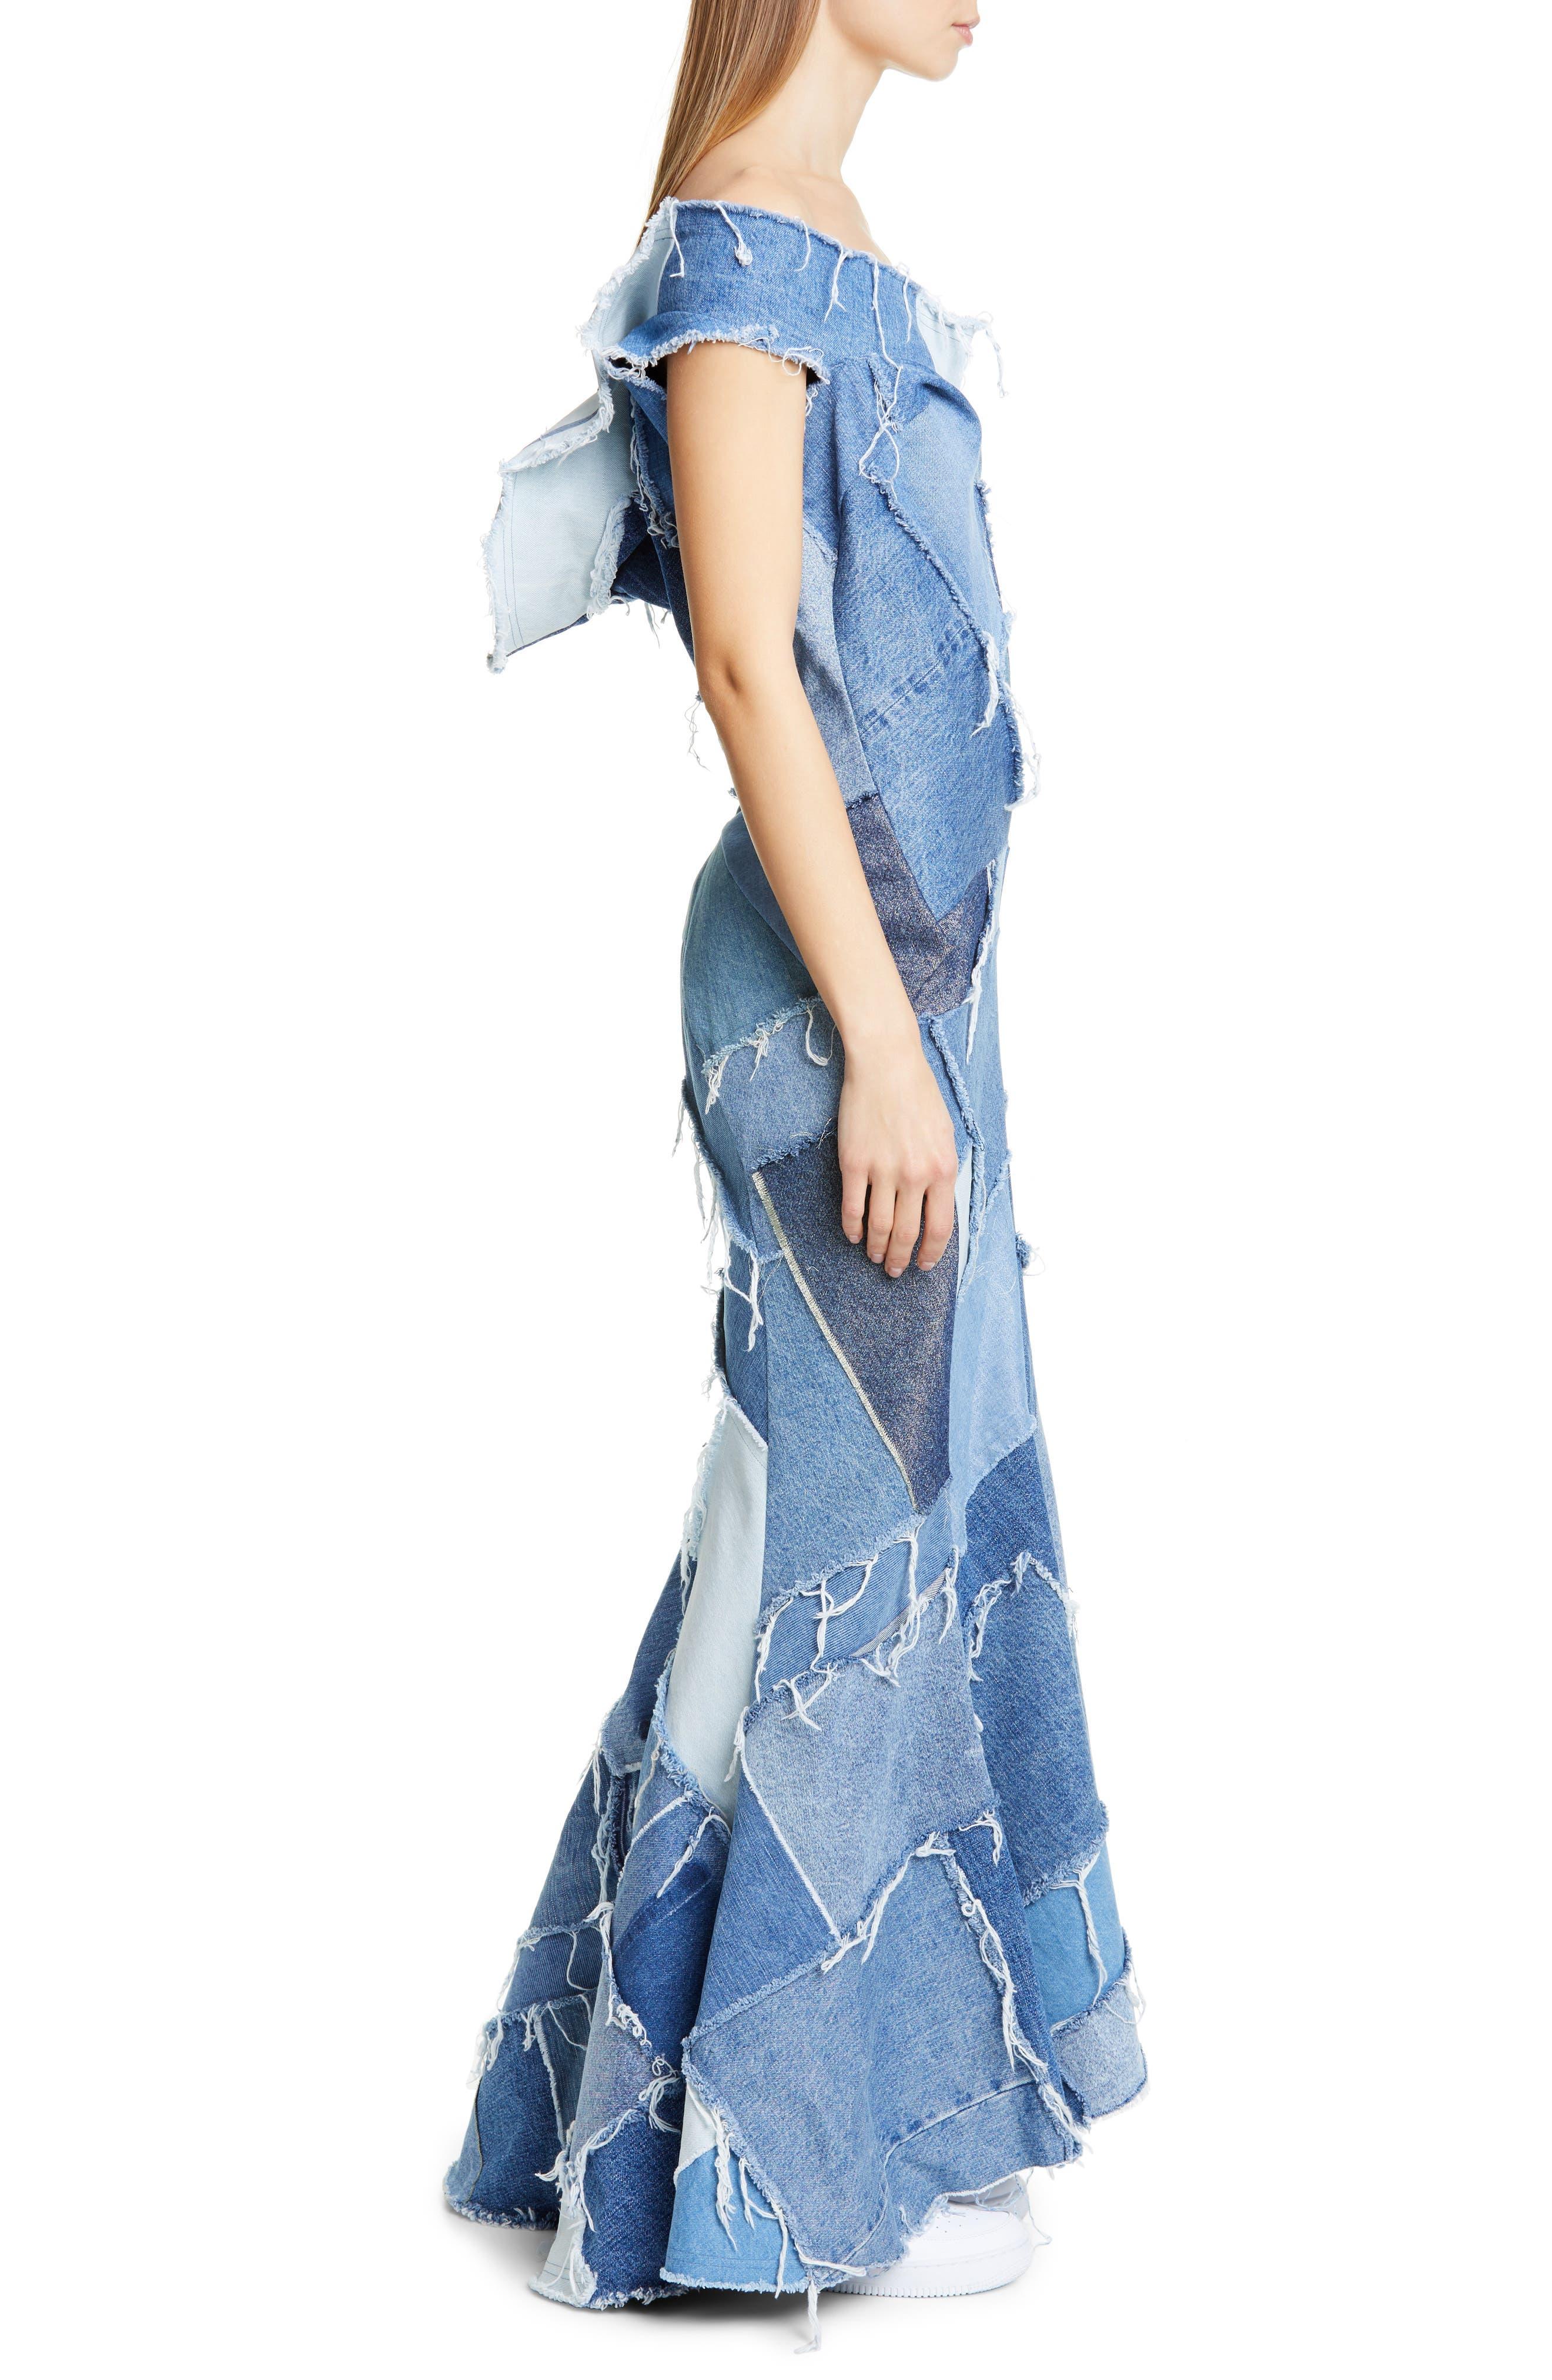 JUNYA WATANABE, Denim Patchwork Off the Shoulder Mermaid Dress, Alternate thumbnail 4, color, INDIGO